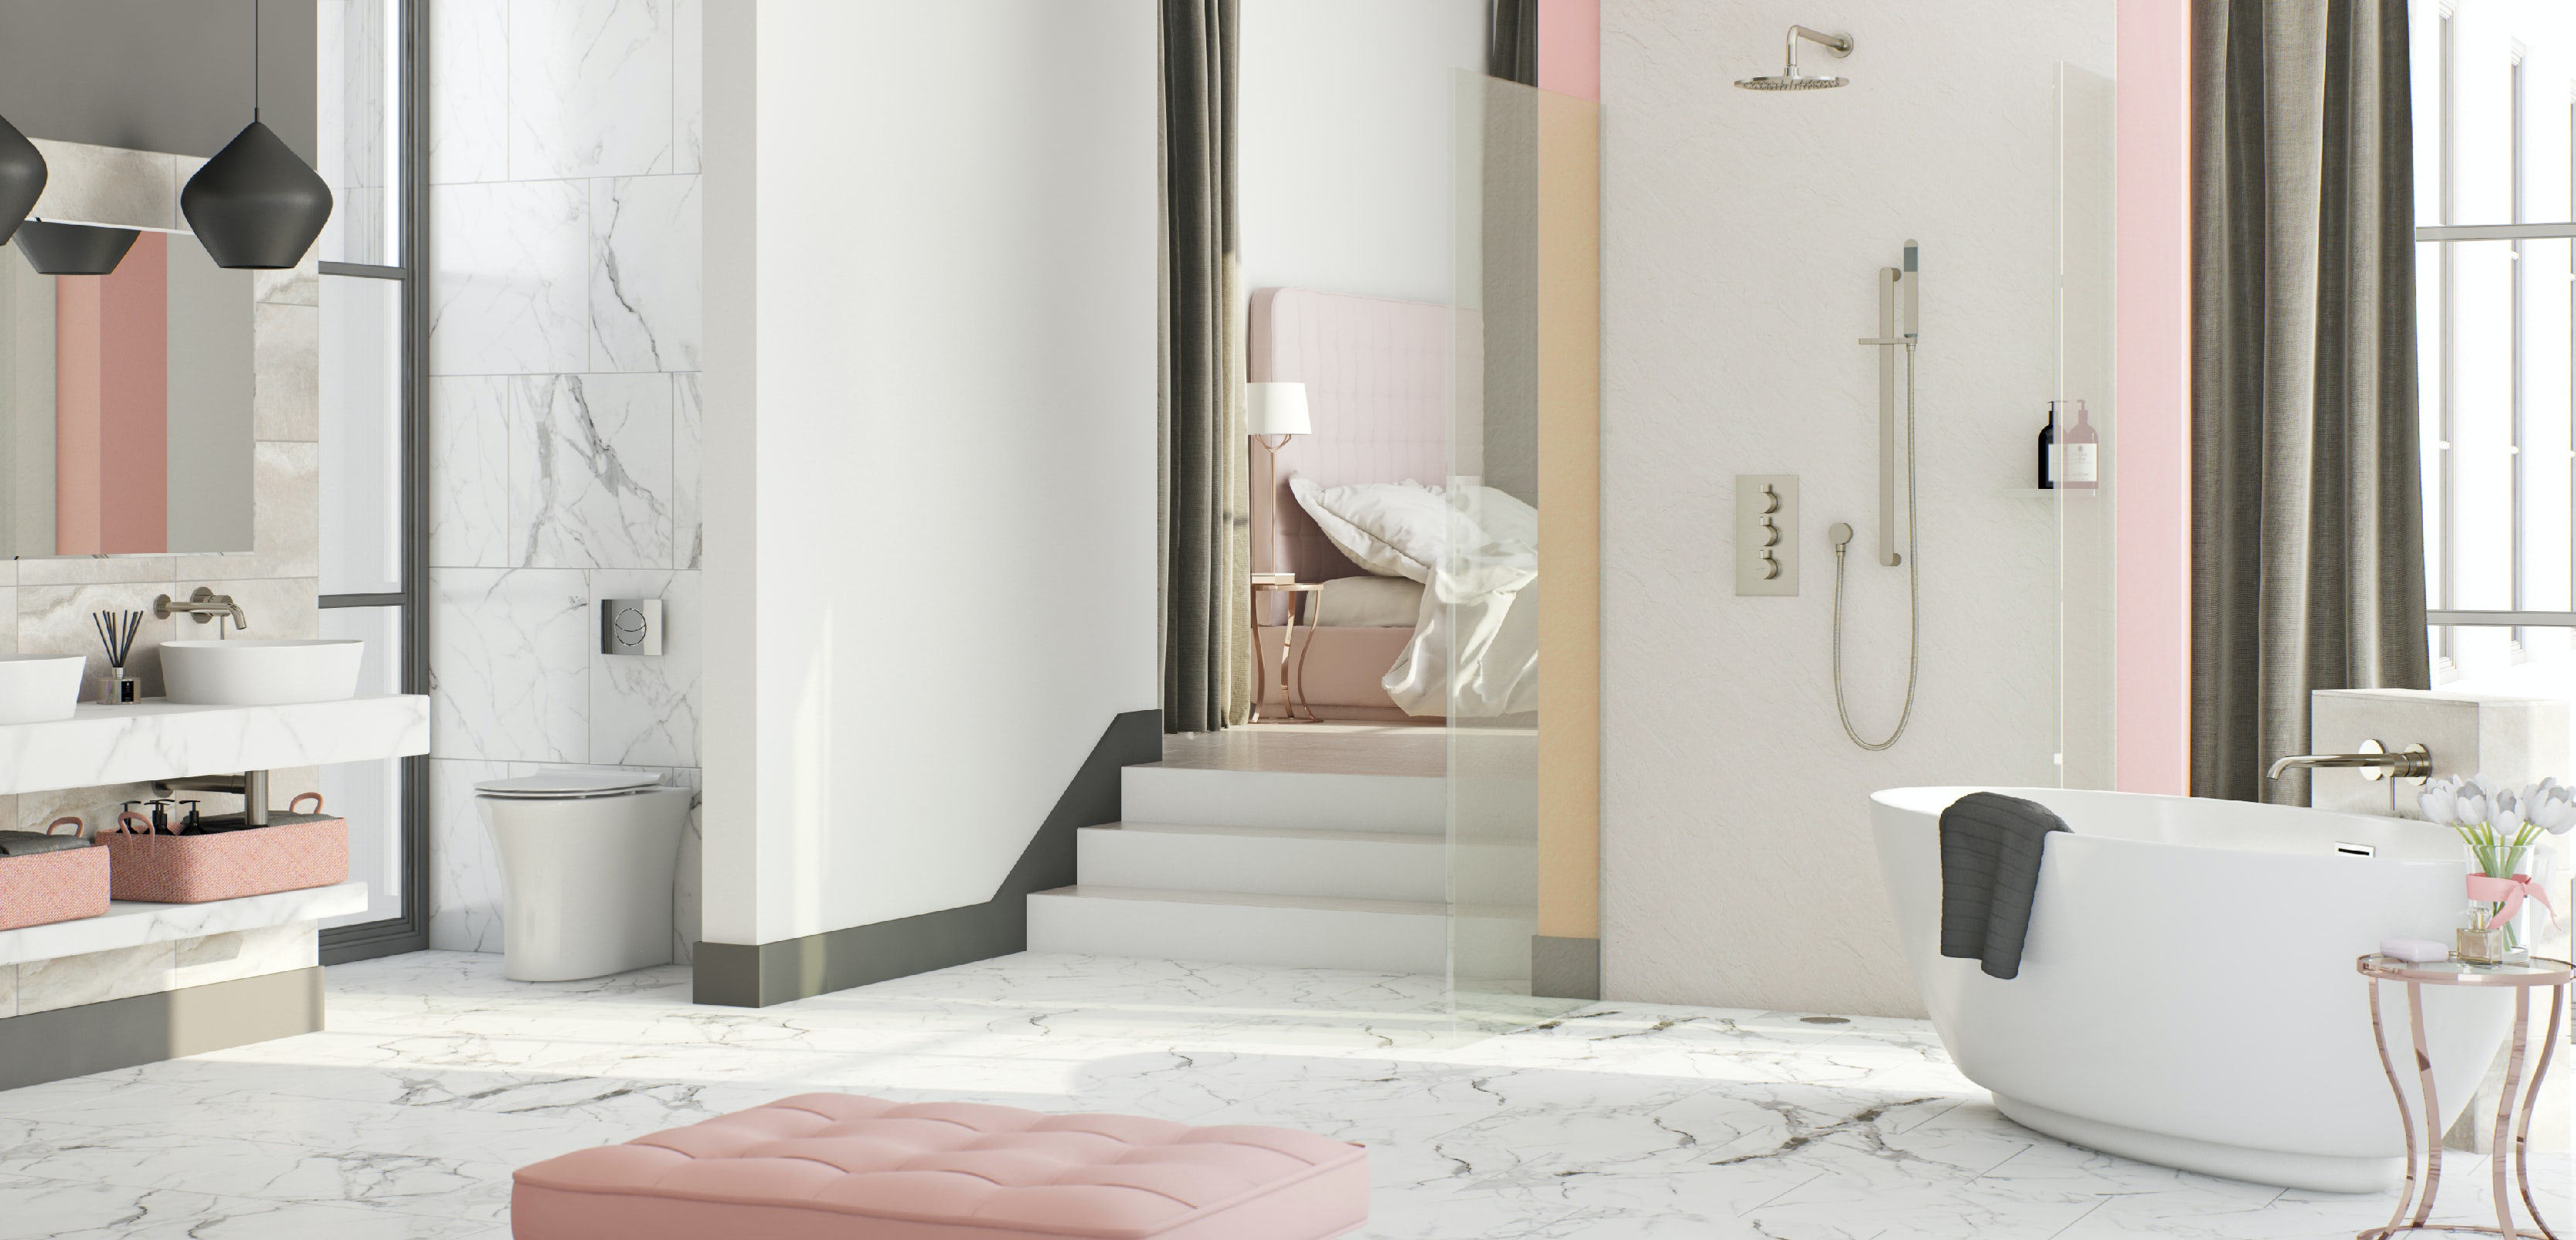 Bathroom ideas: Boutique Blush